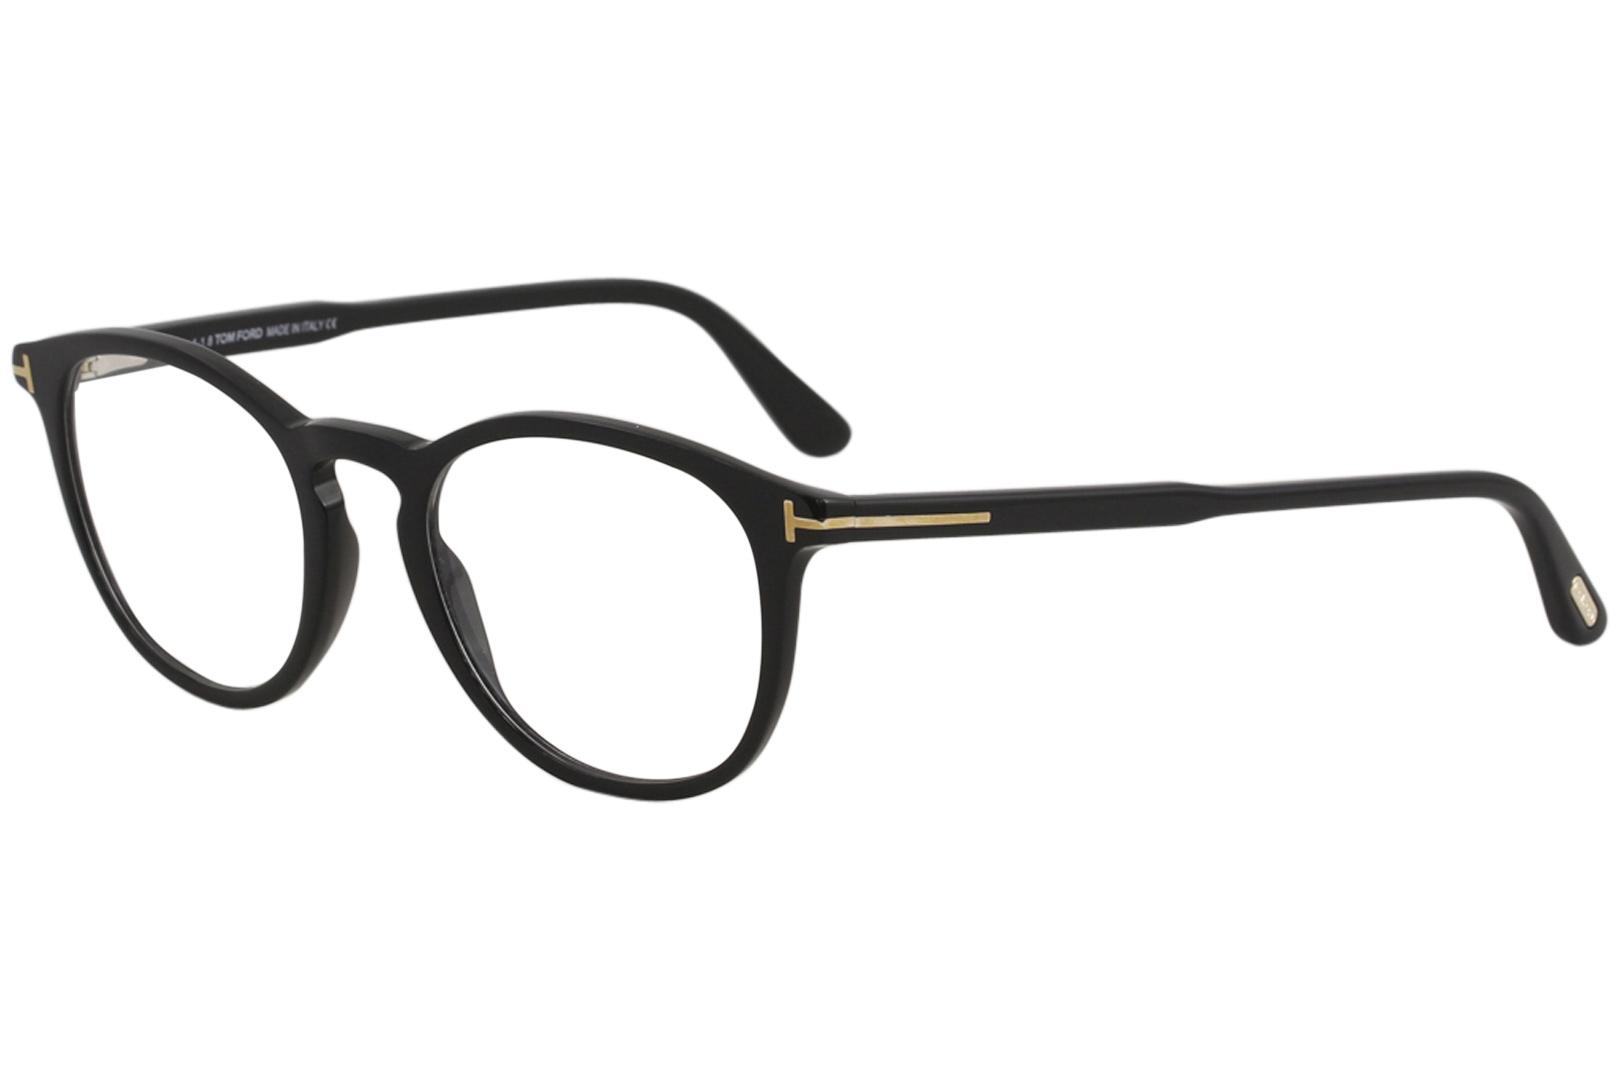 Tom Ford Men s TF5401 TF 5401 001 Shiny Black Full Rim Optical Frame ... 5b23658a09